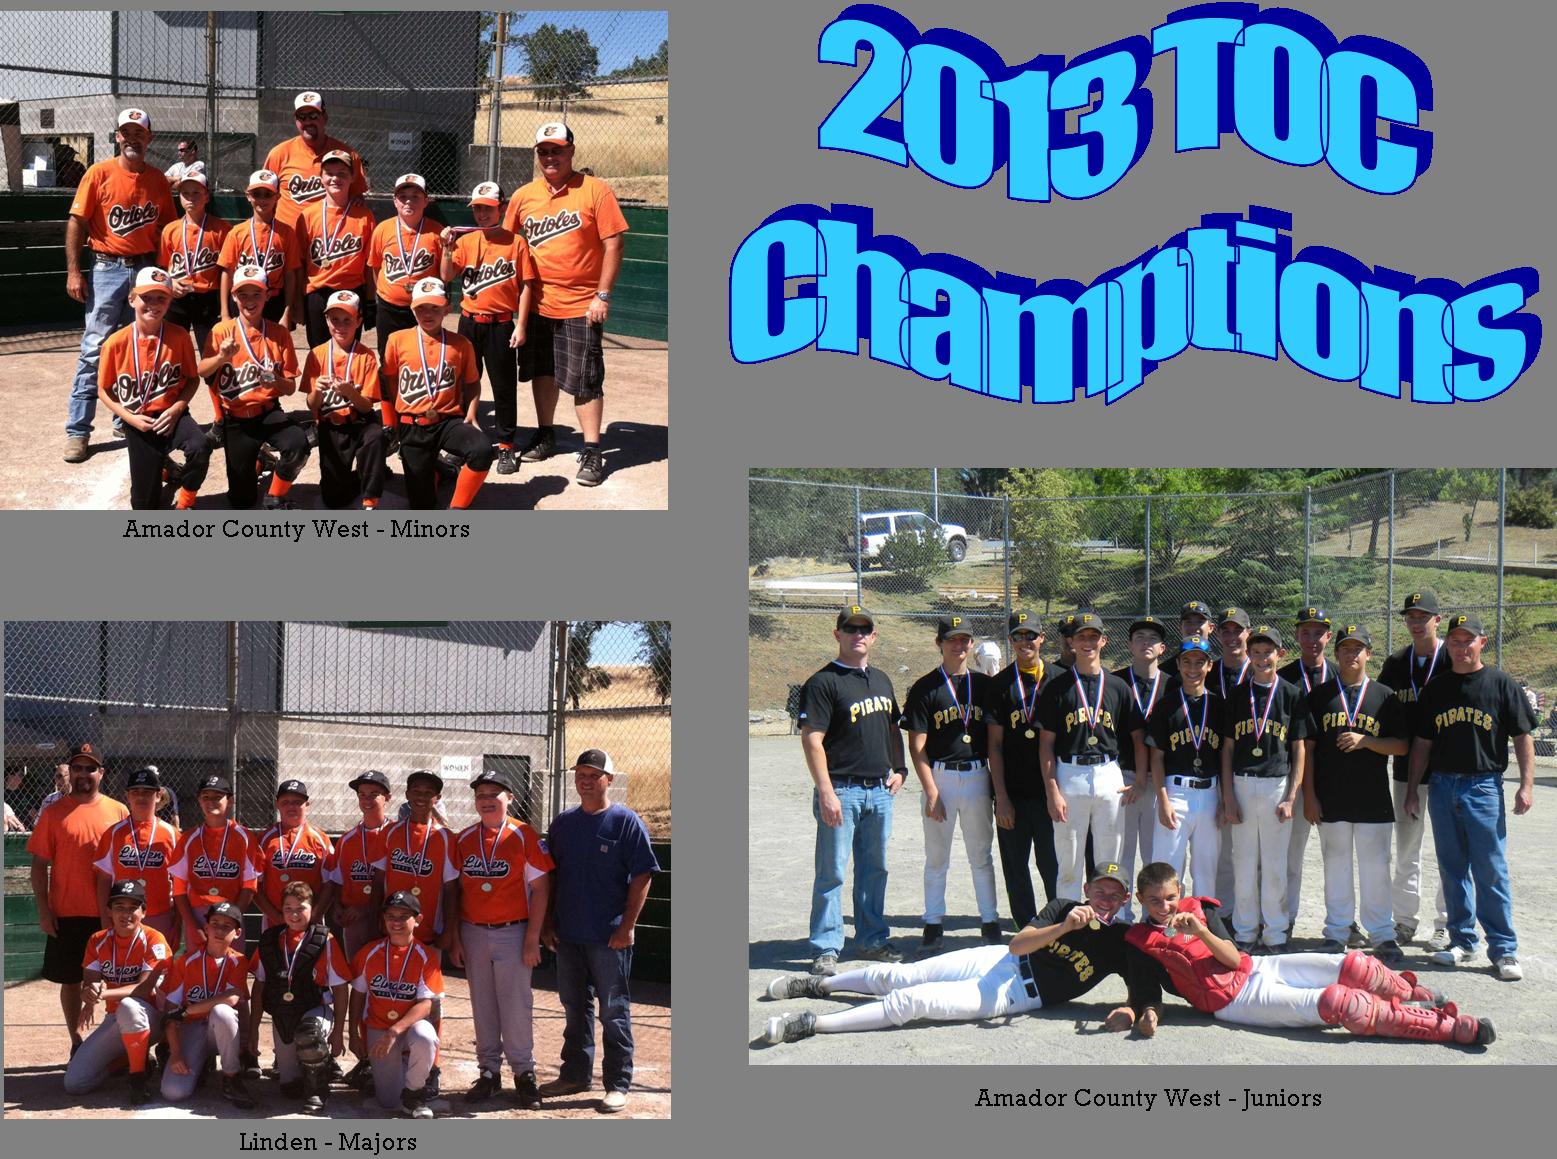 2013 TOC Champtions